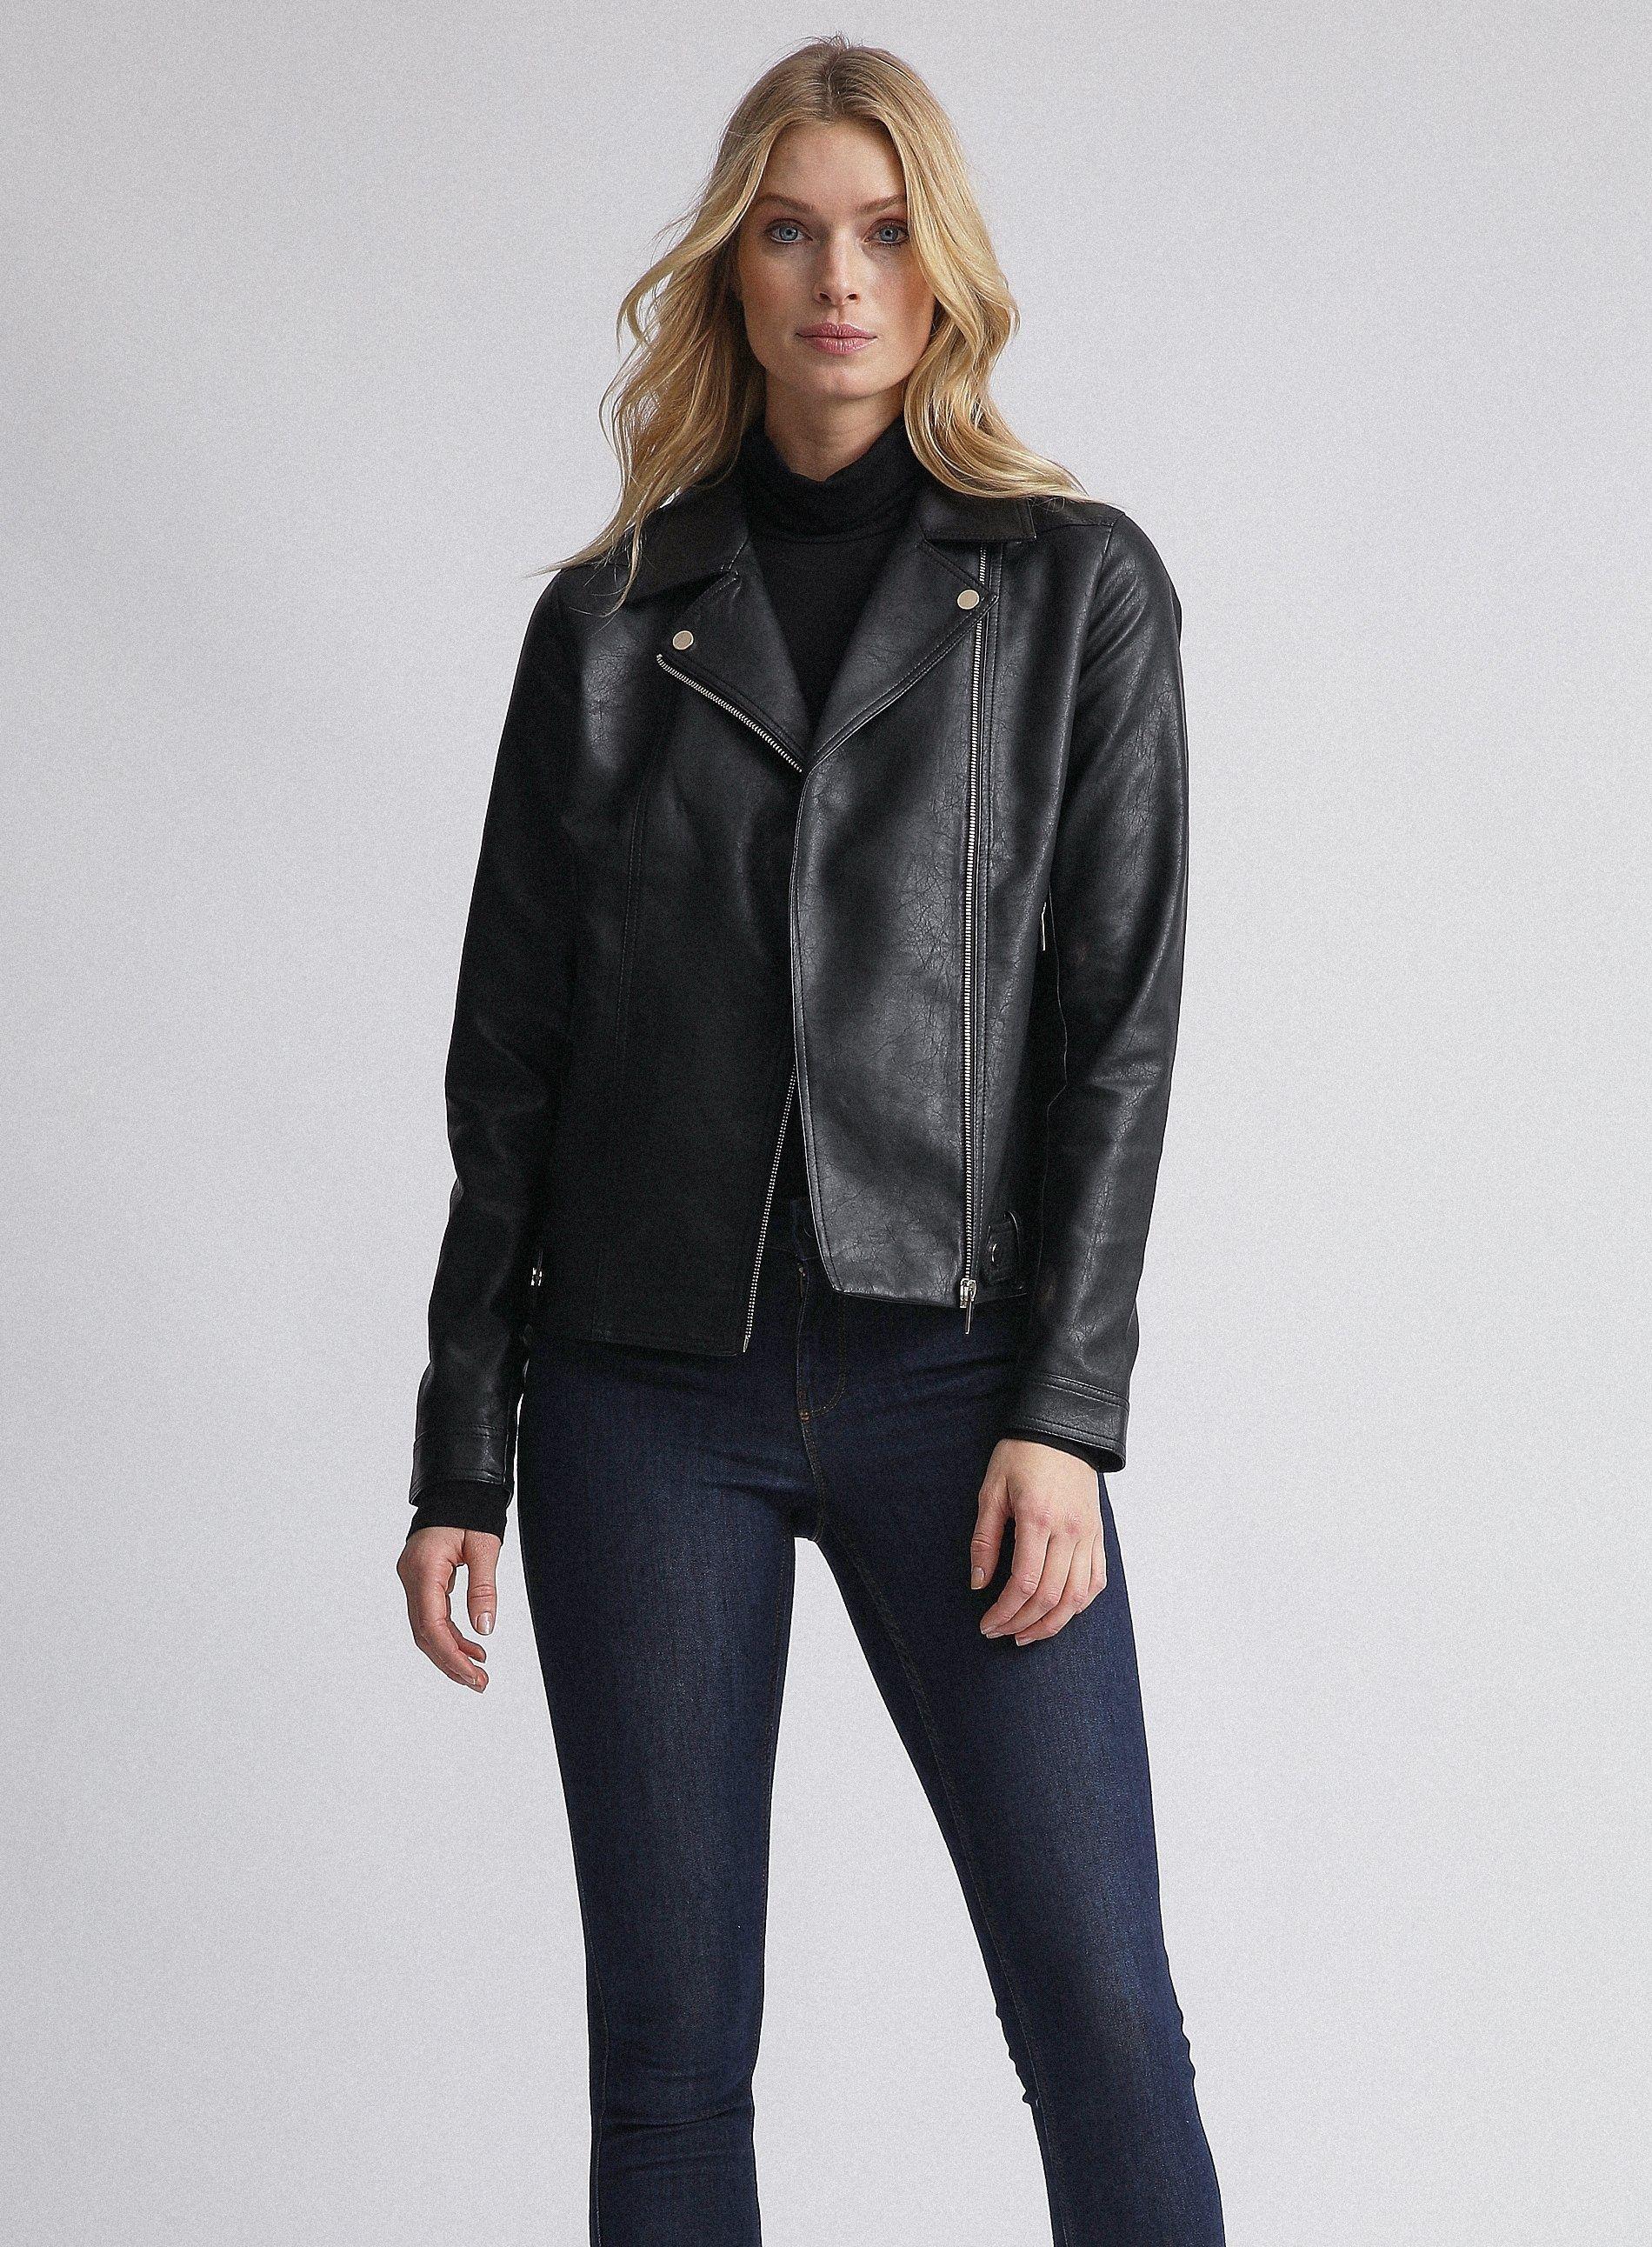 Dorothy Perkins Womens Tall Black PU Biker Jacket Long Sleeve Top Outerwear